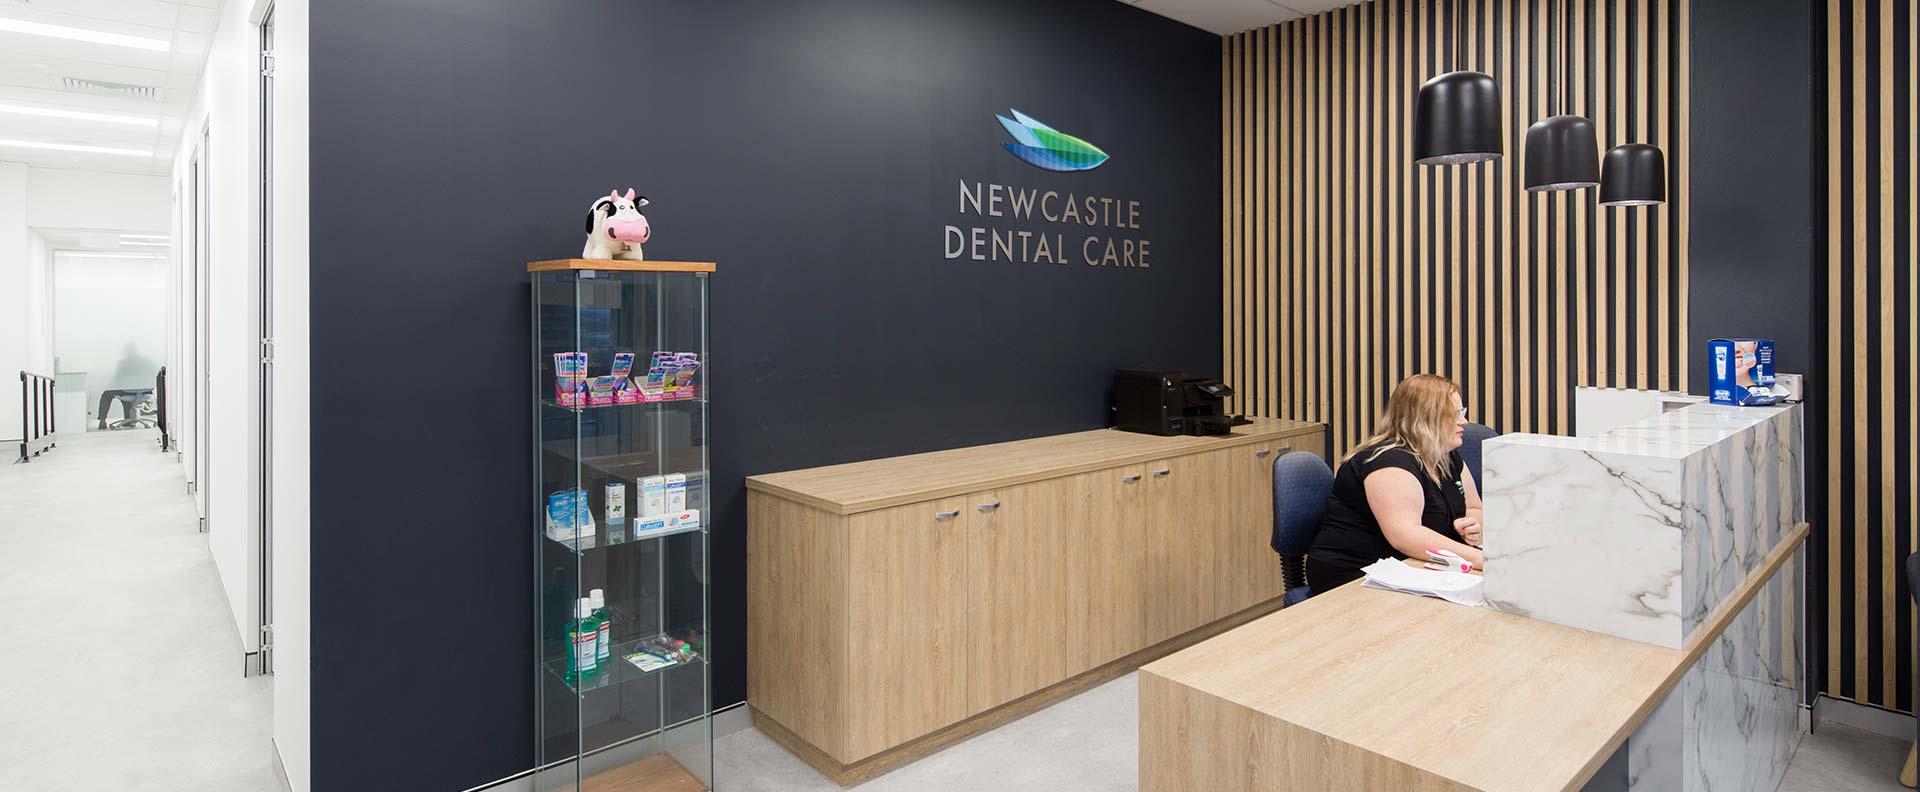 Newcastle Dental